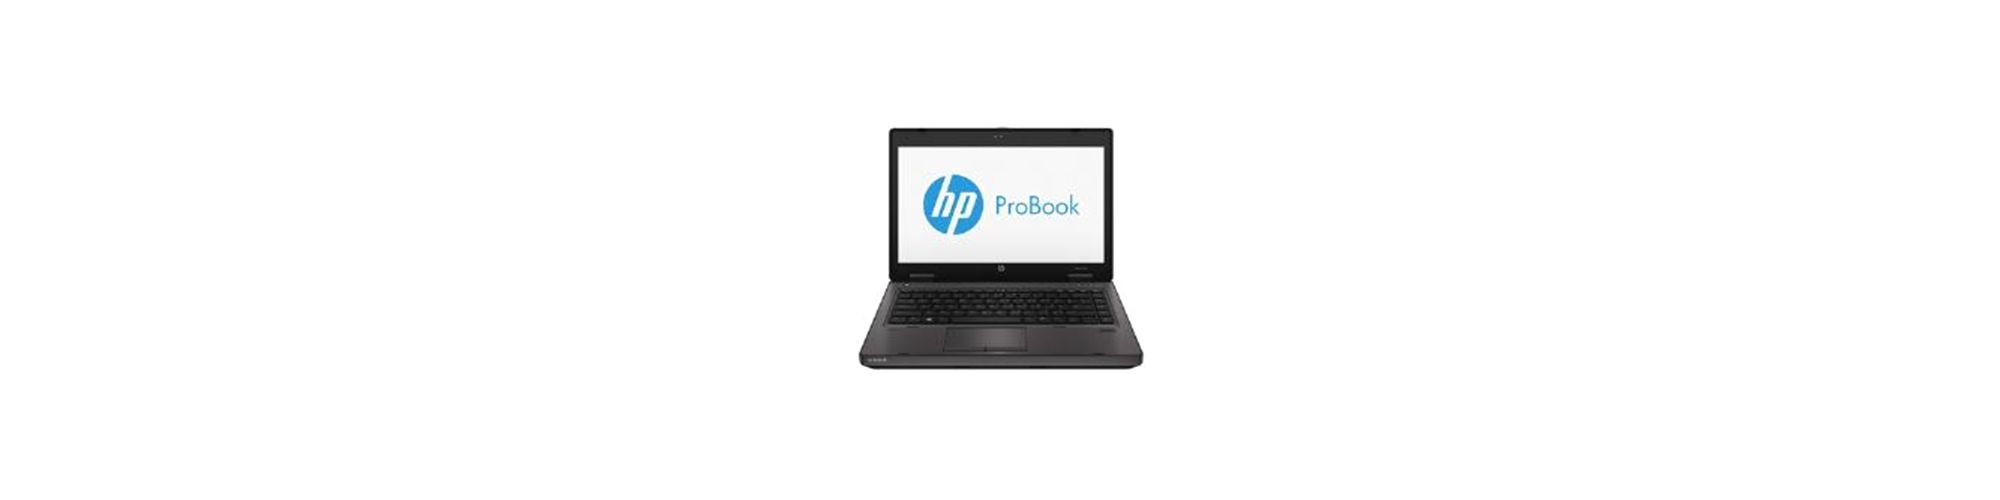 HP ProBook 6470b (14 inch) Notebook Core i5 (3210M) 2.5GHz 4GB 500GB DVD?RW SM DL WLAN BT Webcam Windows 7 Pro 64-bit (Intel HD Graphics)